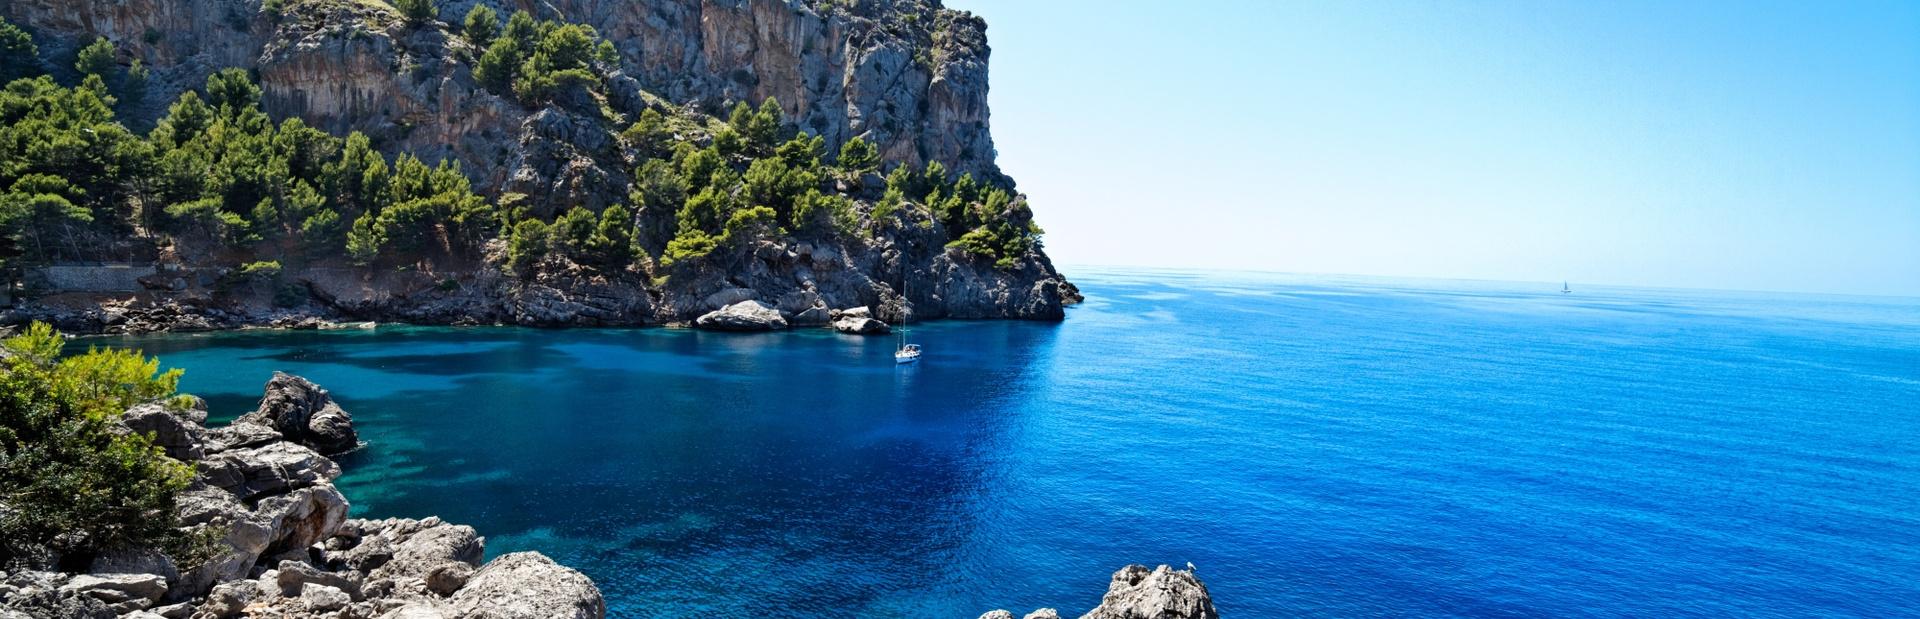 Mallorca news photo